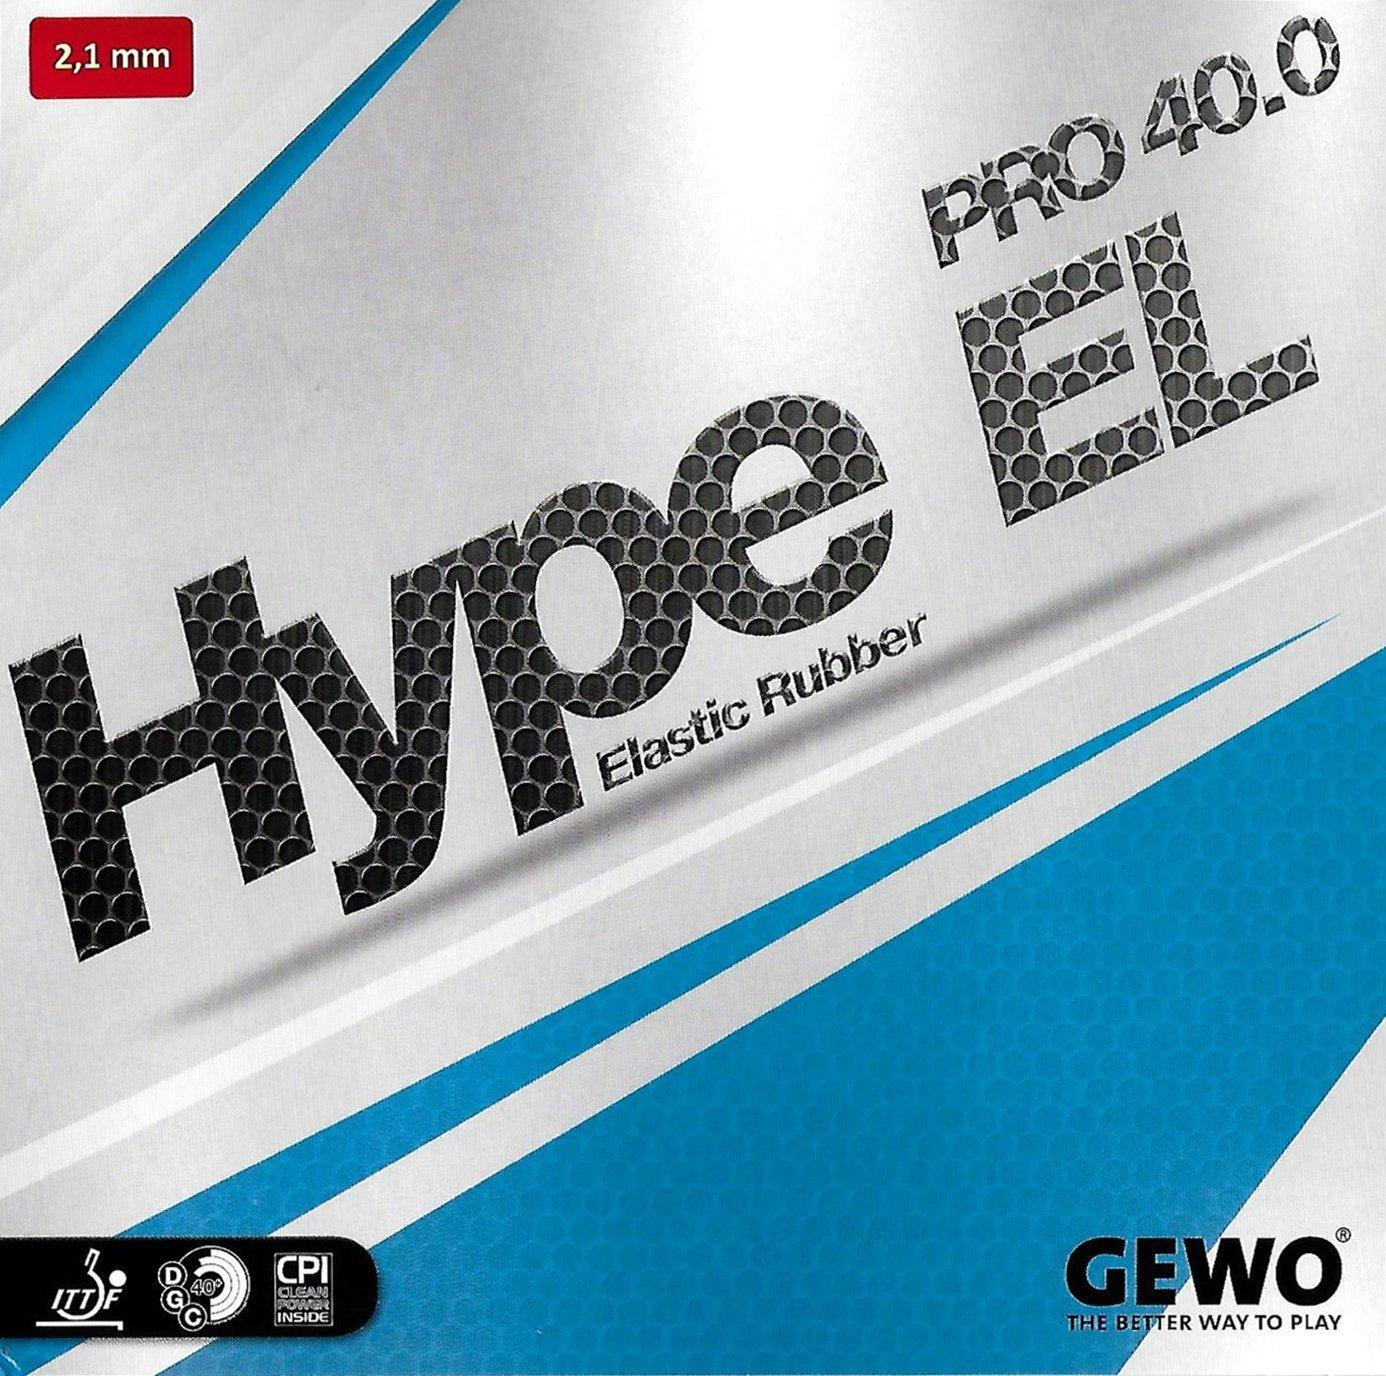 Gewo Hype El Pro 40.0テーブルテニスゴム、ブラック、2.1 MM。スポンジ厚さ B01FUFO9KQ